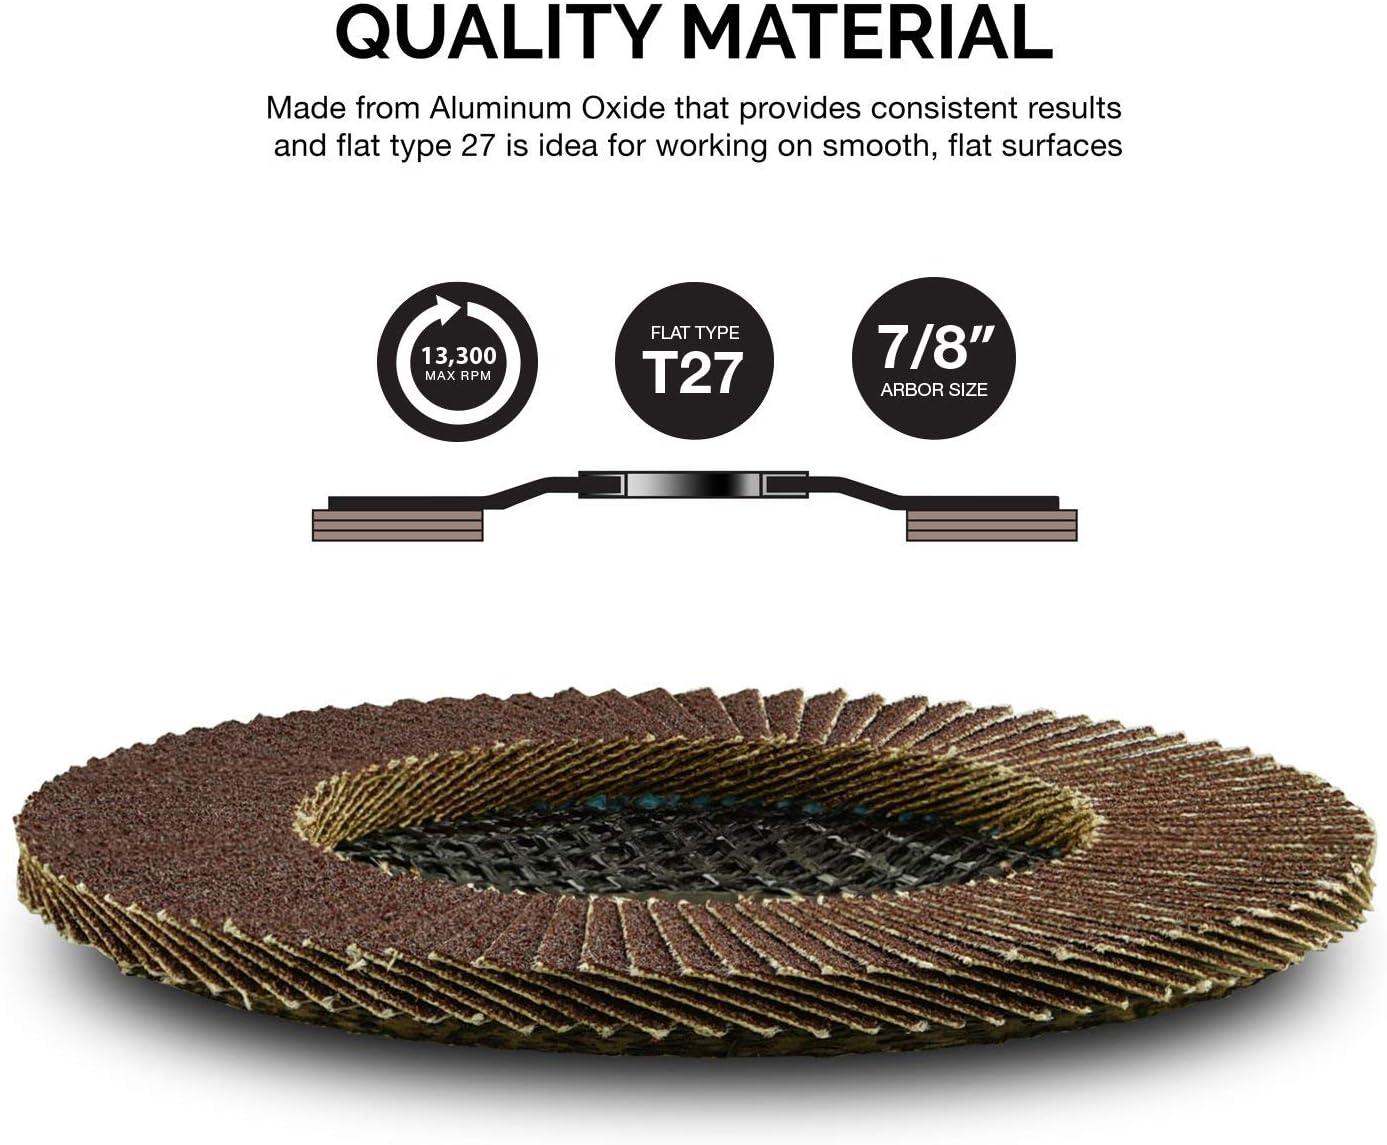 Neiko 11107A Aluminum Oxide Flap Disc Fiberglass Backing Plate Flat Type #27 4.5 x 7//8 Inch 10 Pack 60 Grit